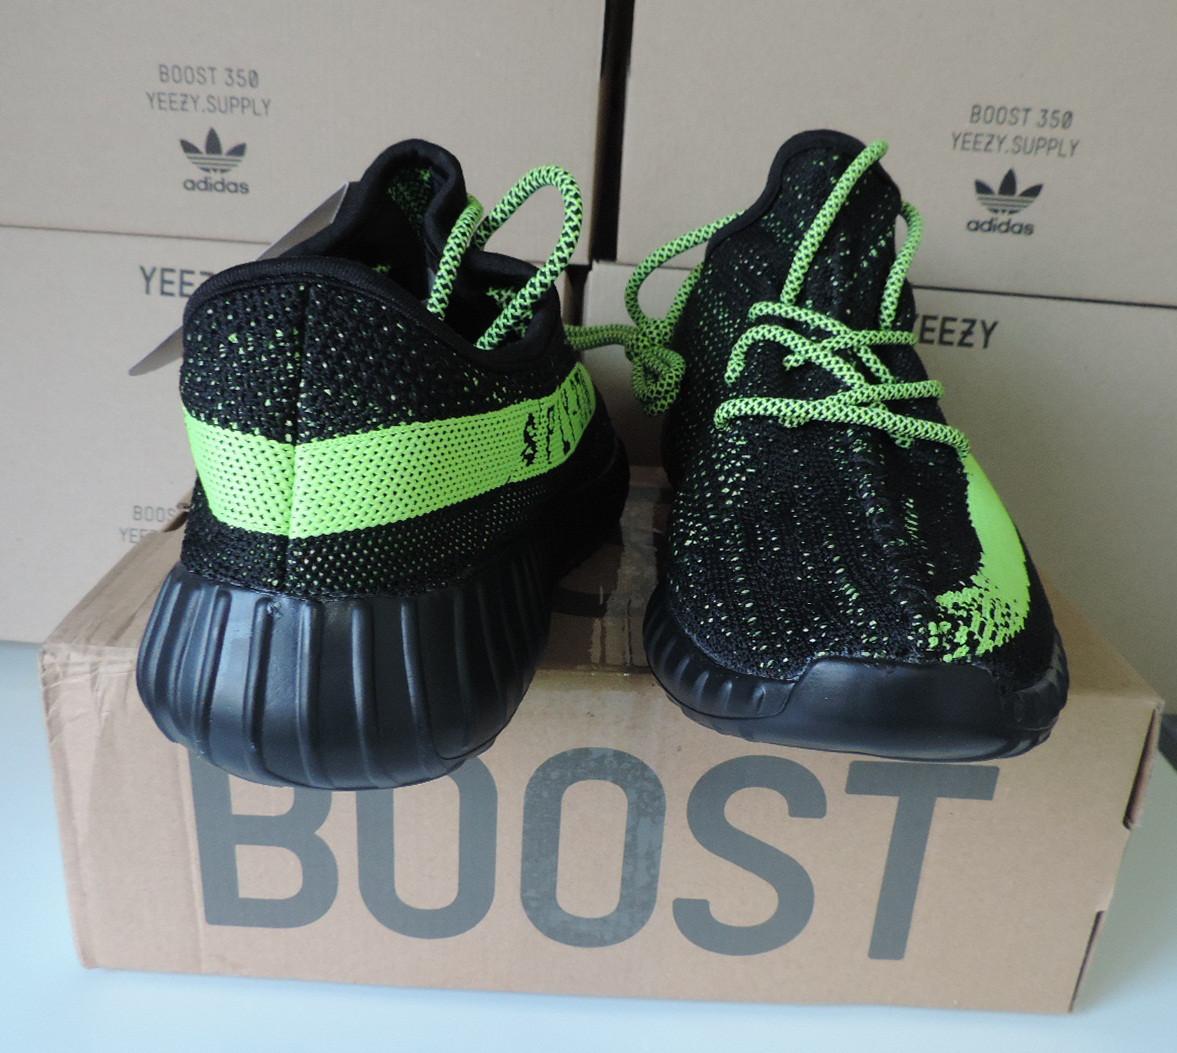 4fd060ee ... Мужские кроссовки SPLY 370. Adidas Yeezy Boost 350 V2 - реплика., ...